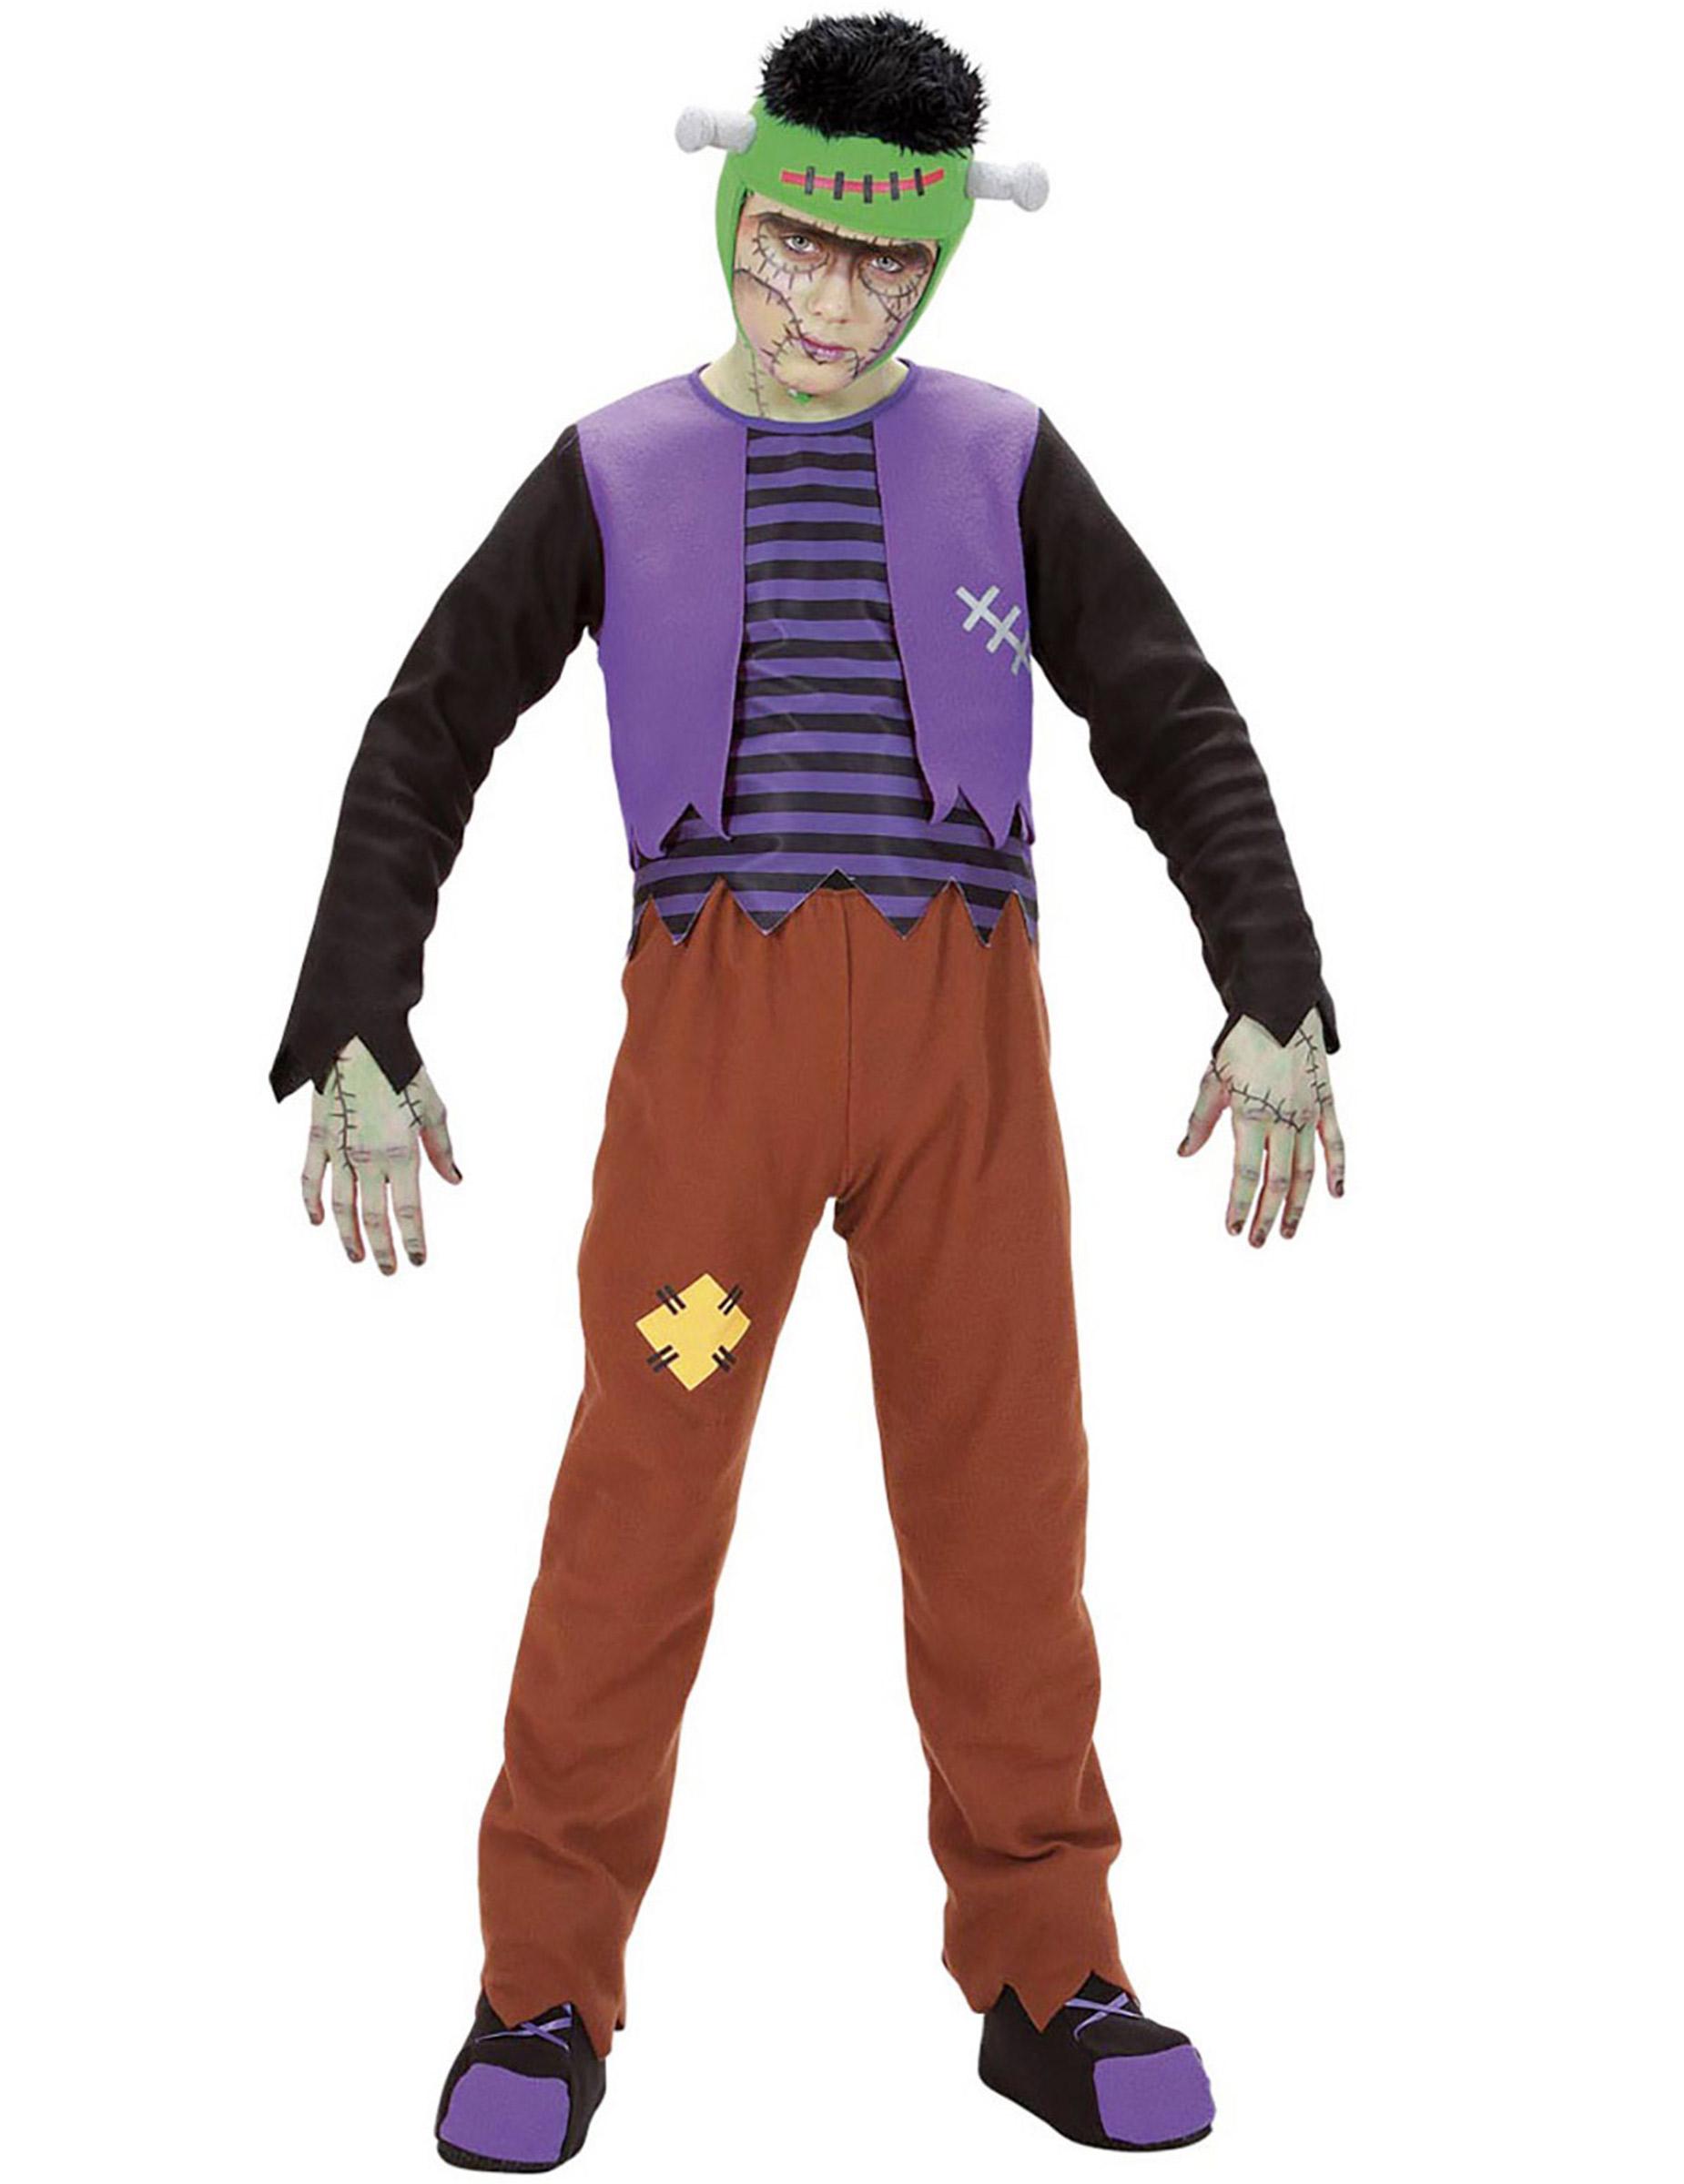 Monster Kostuem Fuer Jungen.Uberlebendes Monster Kostum Fur Jungen Halloweenkostum Bunt Gunstige Faschings Kostume Bei Karneval Megastore